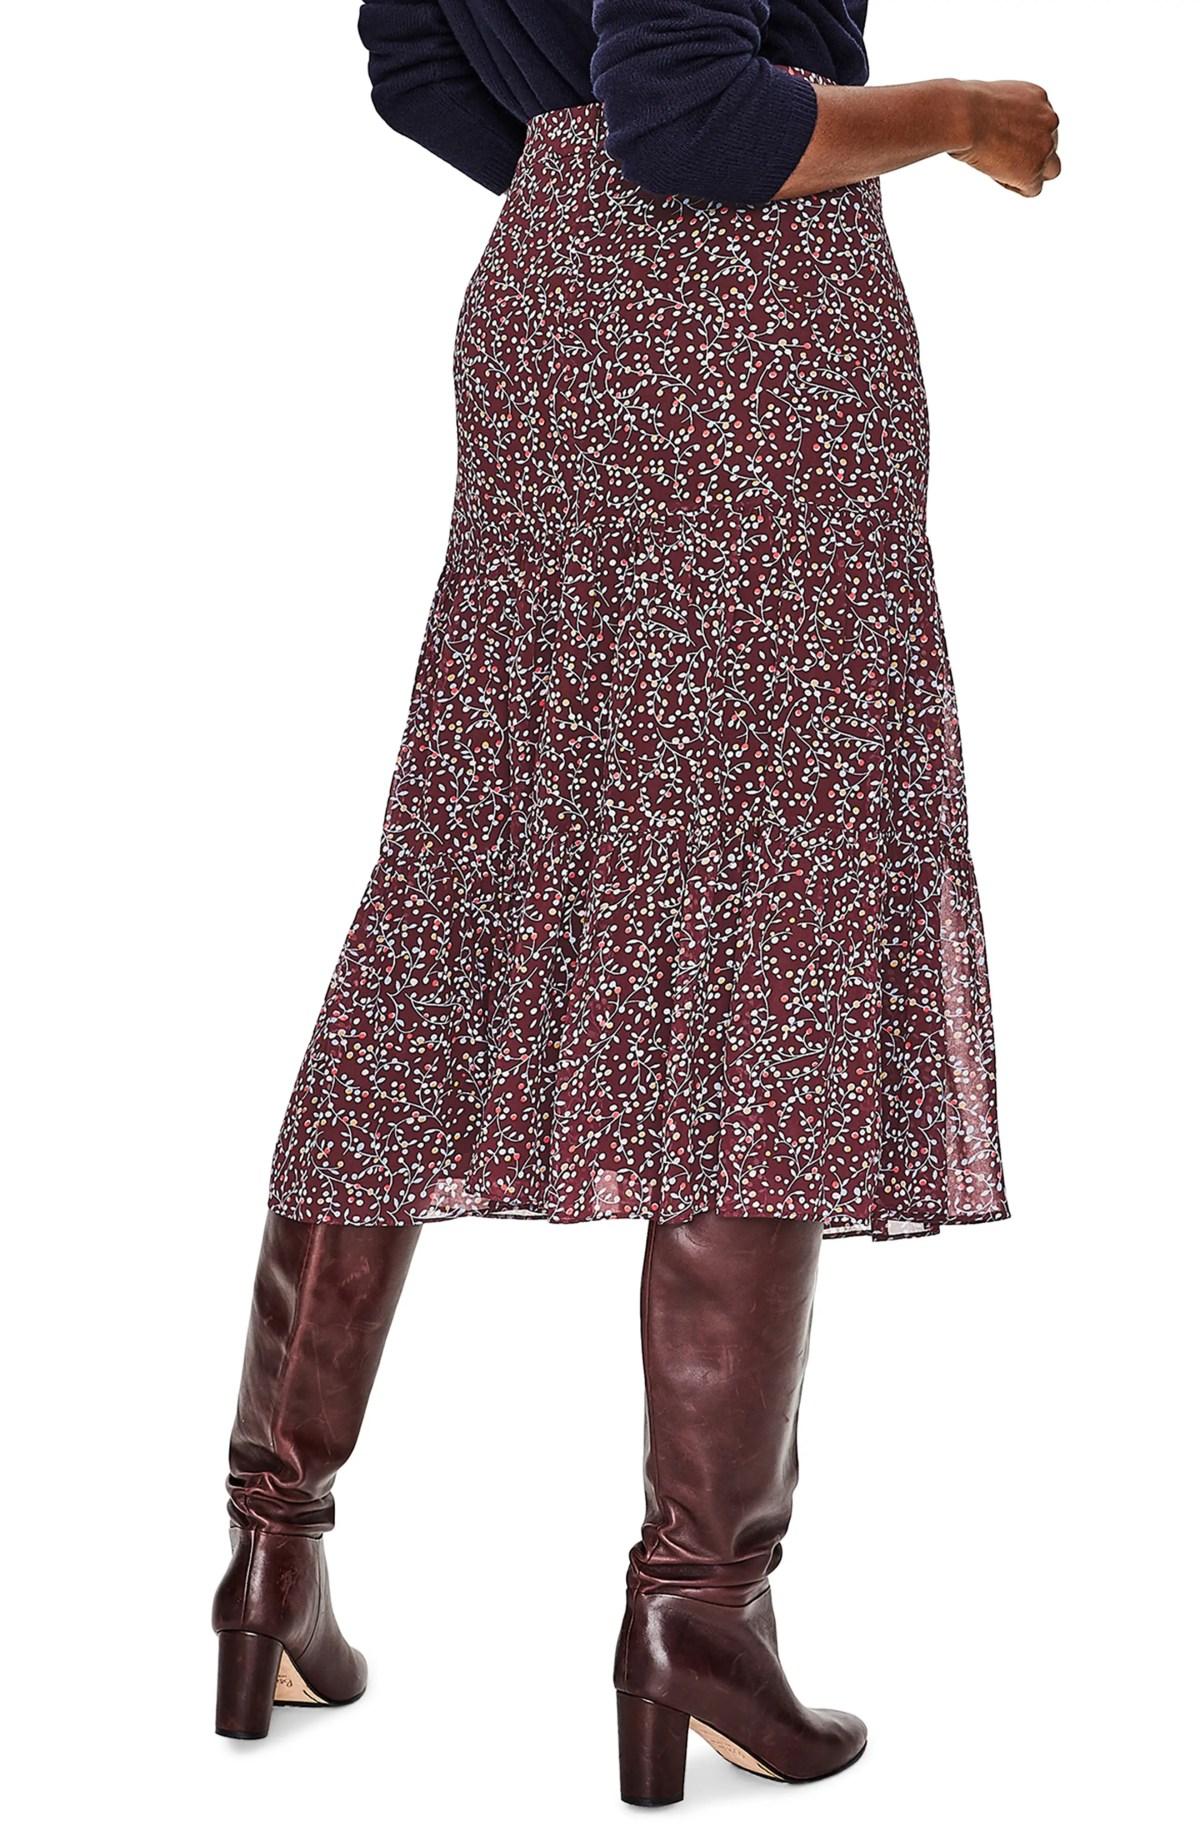 Frome Midi Skirt,                         Alternate,                         color, DARK BURGUNDY TWINKLE VINE